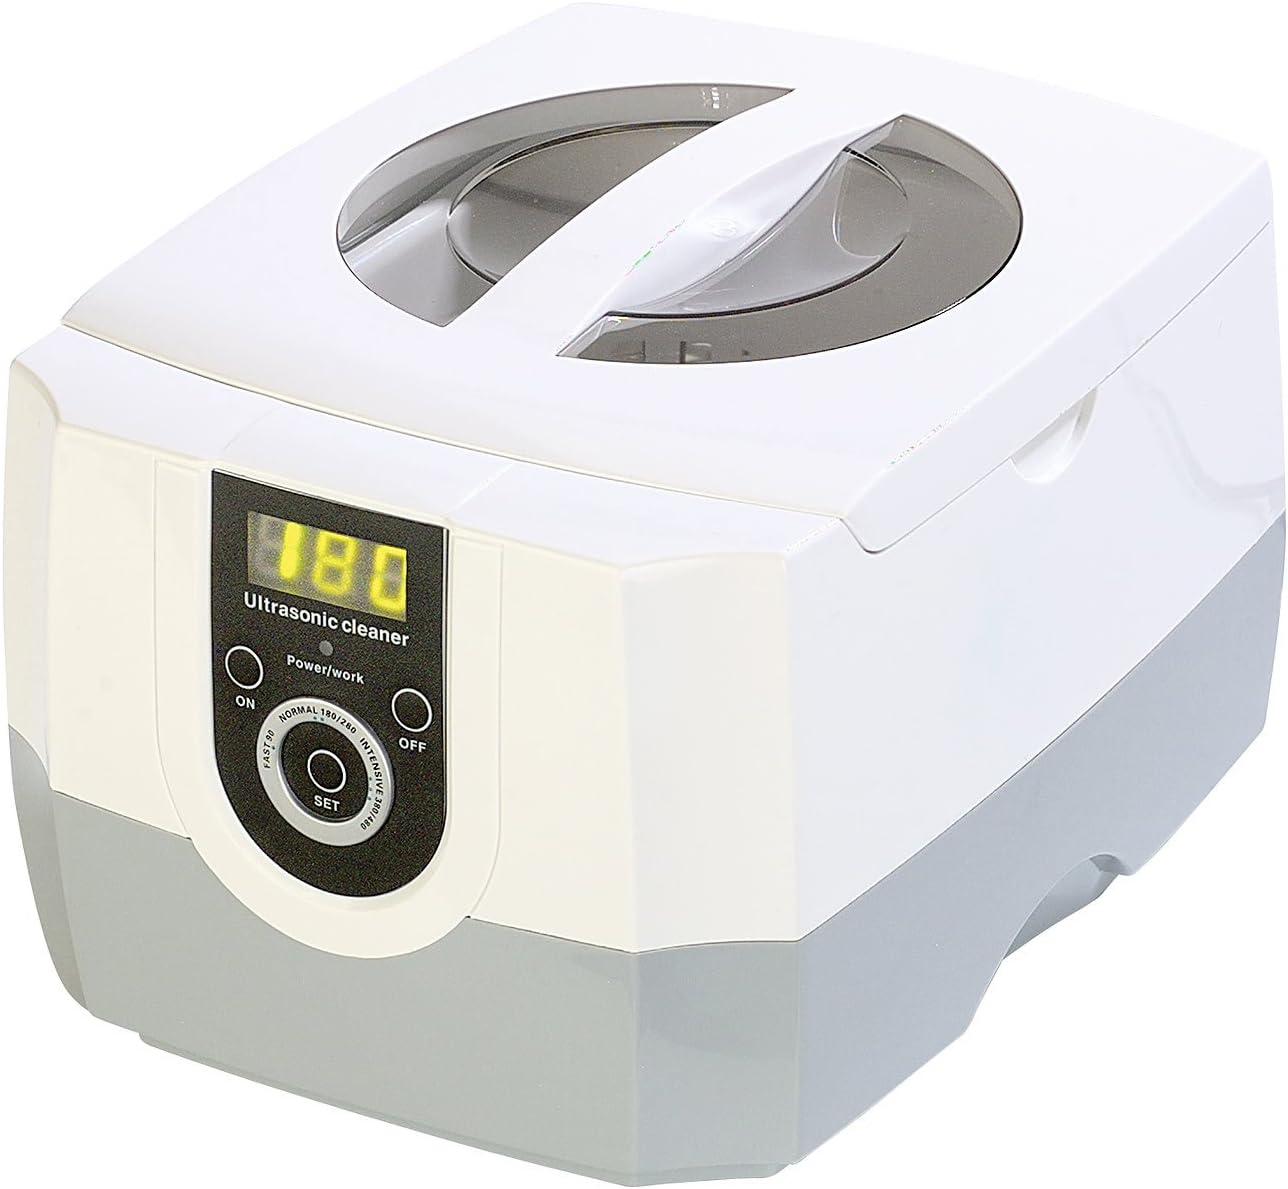 70 Watt Profi Ultraschallreiniger newgen medicals Ultraschallreiniger: Profi-Ultraschall-Reiniger f/ür Schmuck Brillen u.v.m